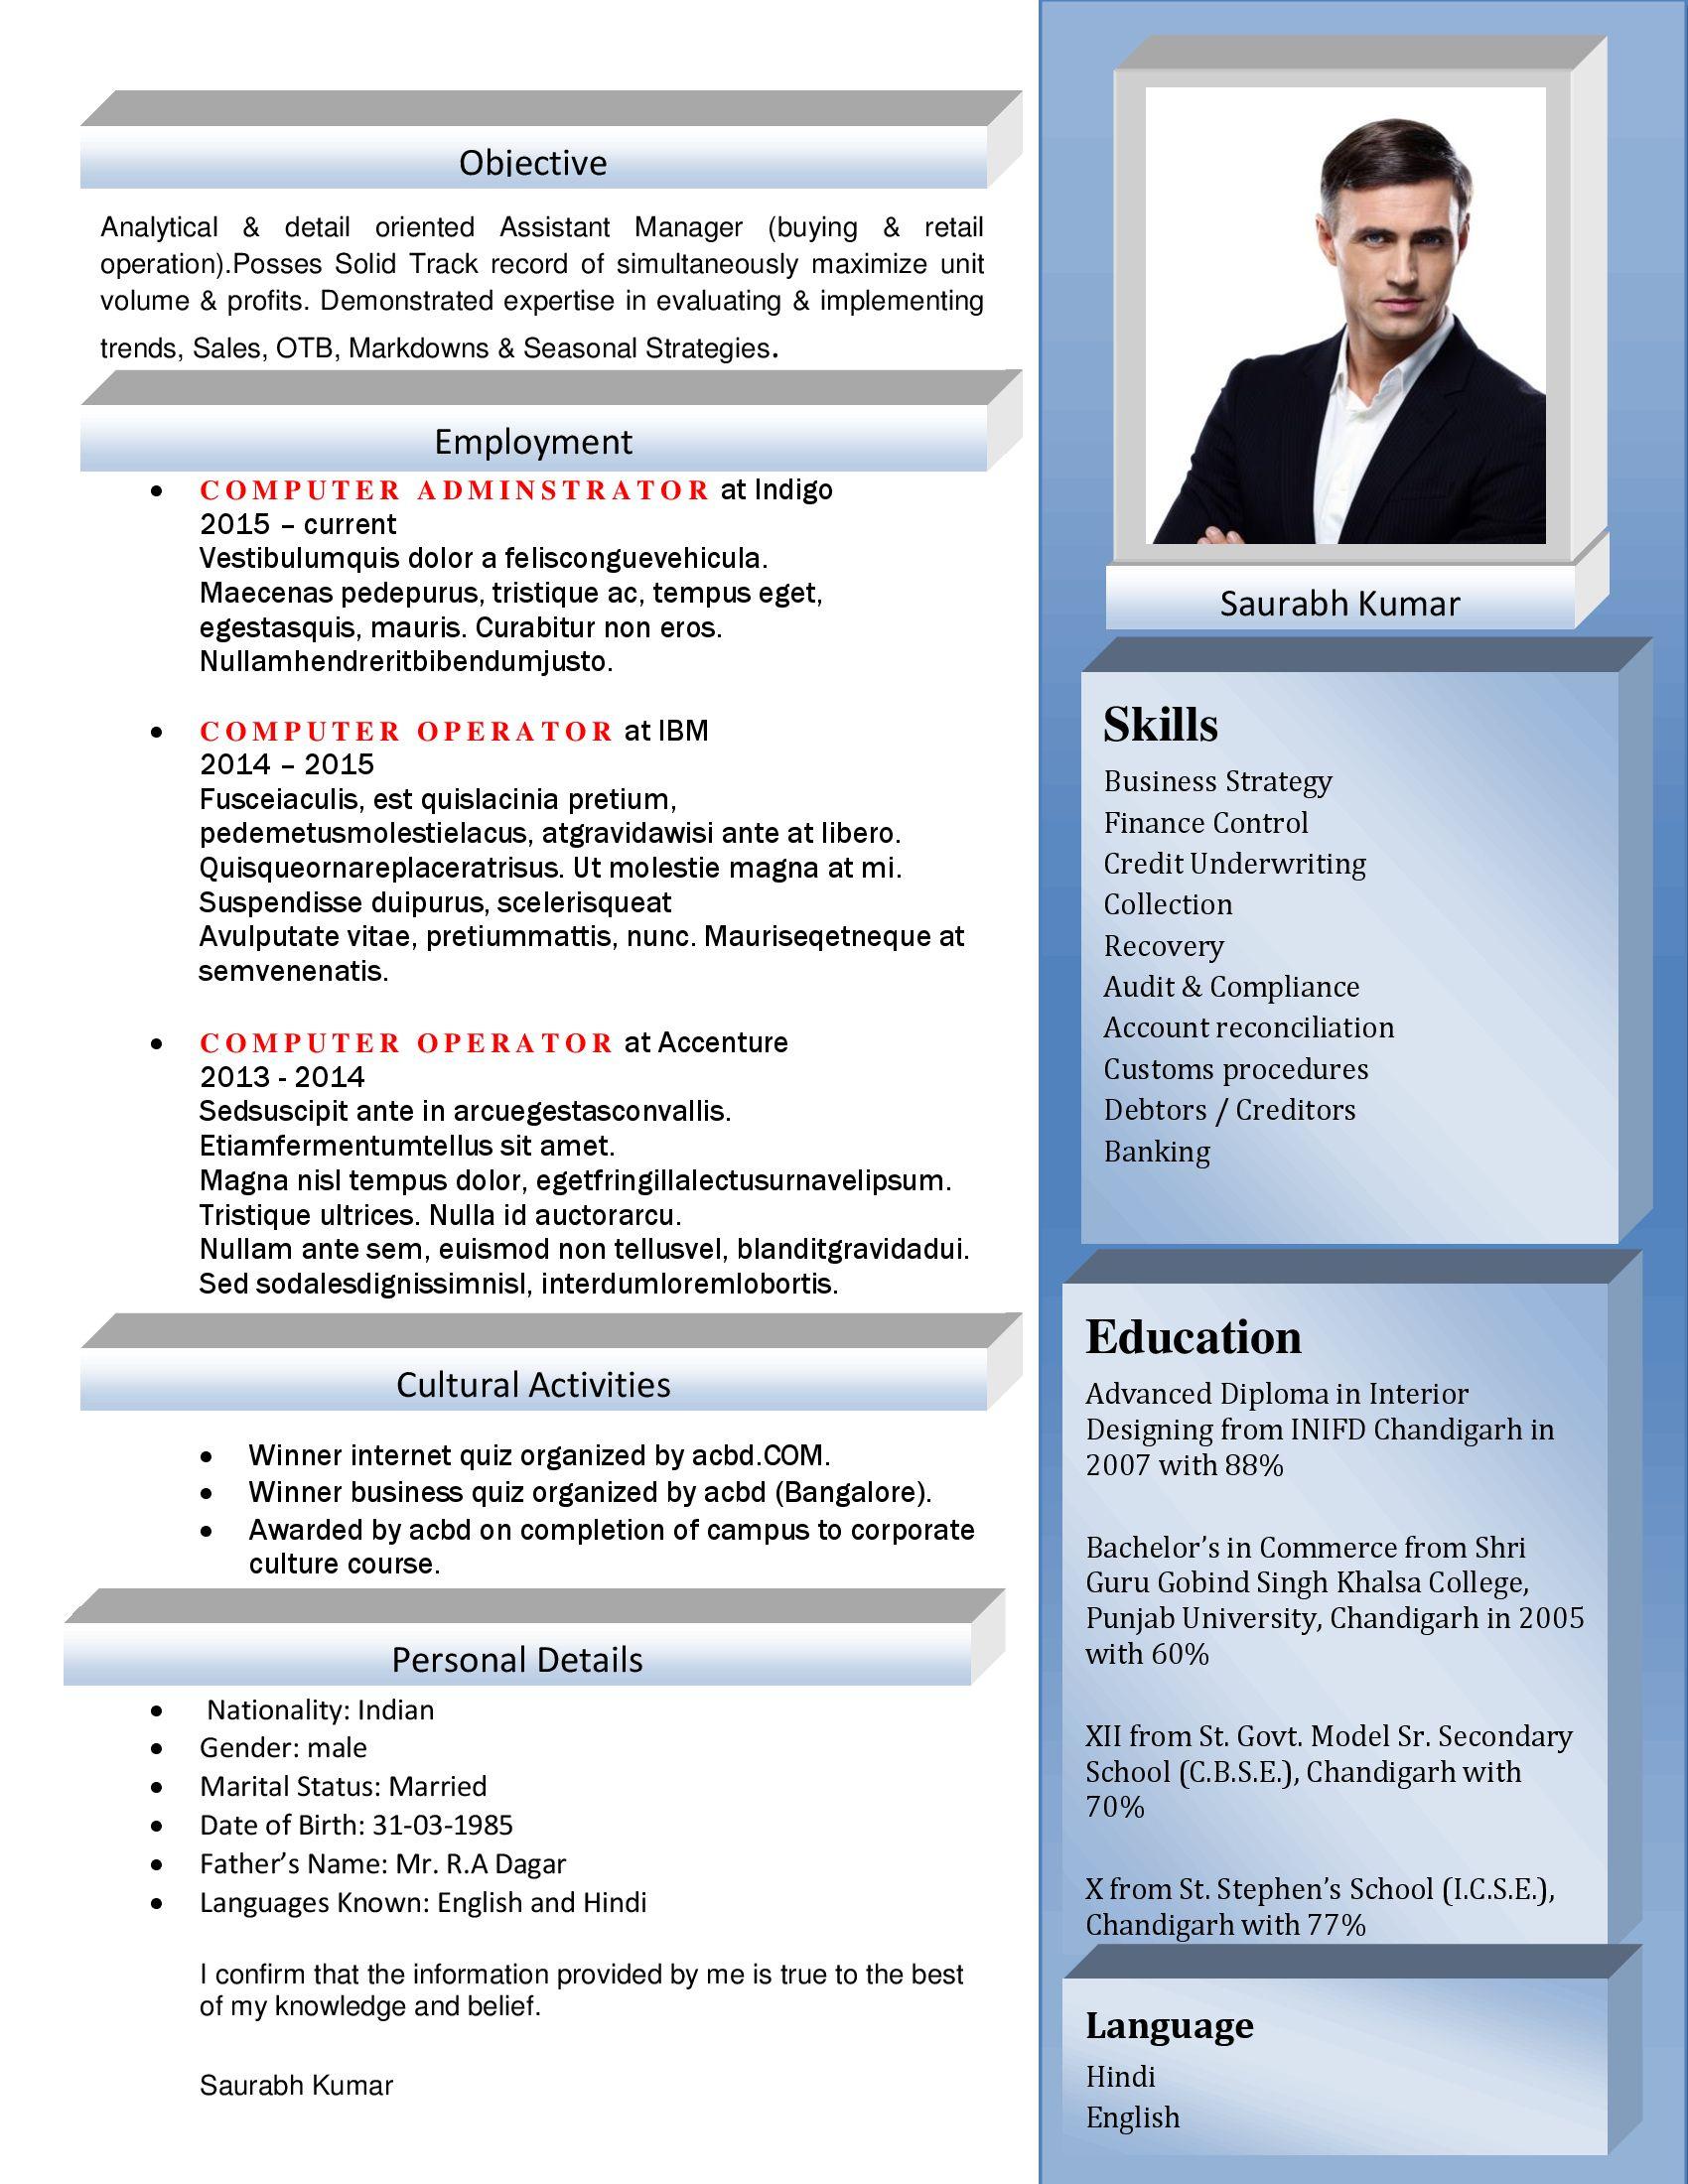 Seo Executive Resume Seo Executive Resume Format Seo Executive Resume Sample Best Resume Template Resume Best Resume